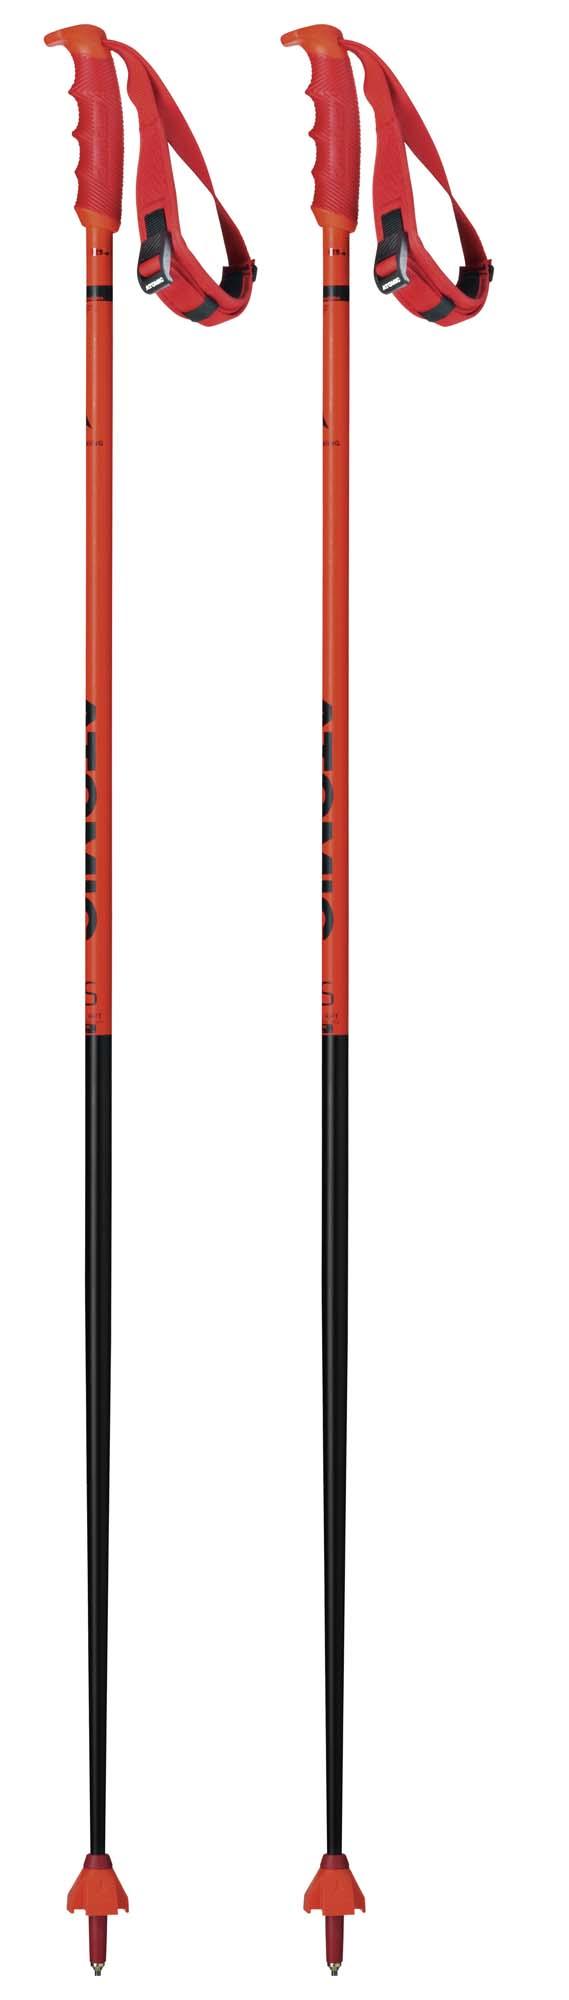 Atomic 2020 Redster RS Blk/Red Ski Poles NEW !! 125,130,135cm